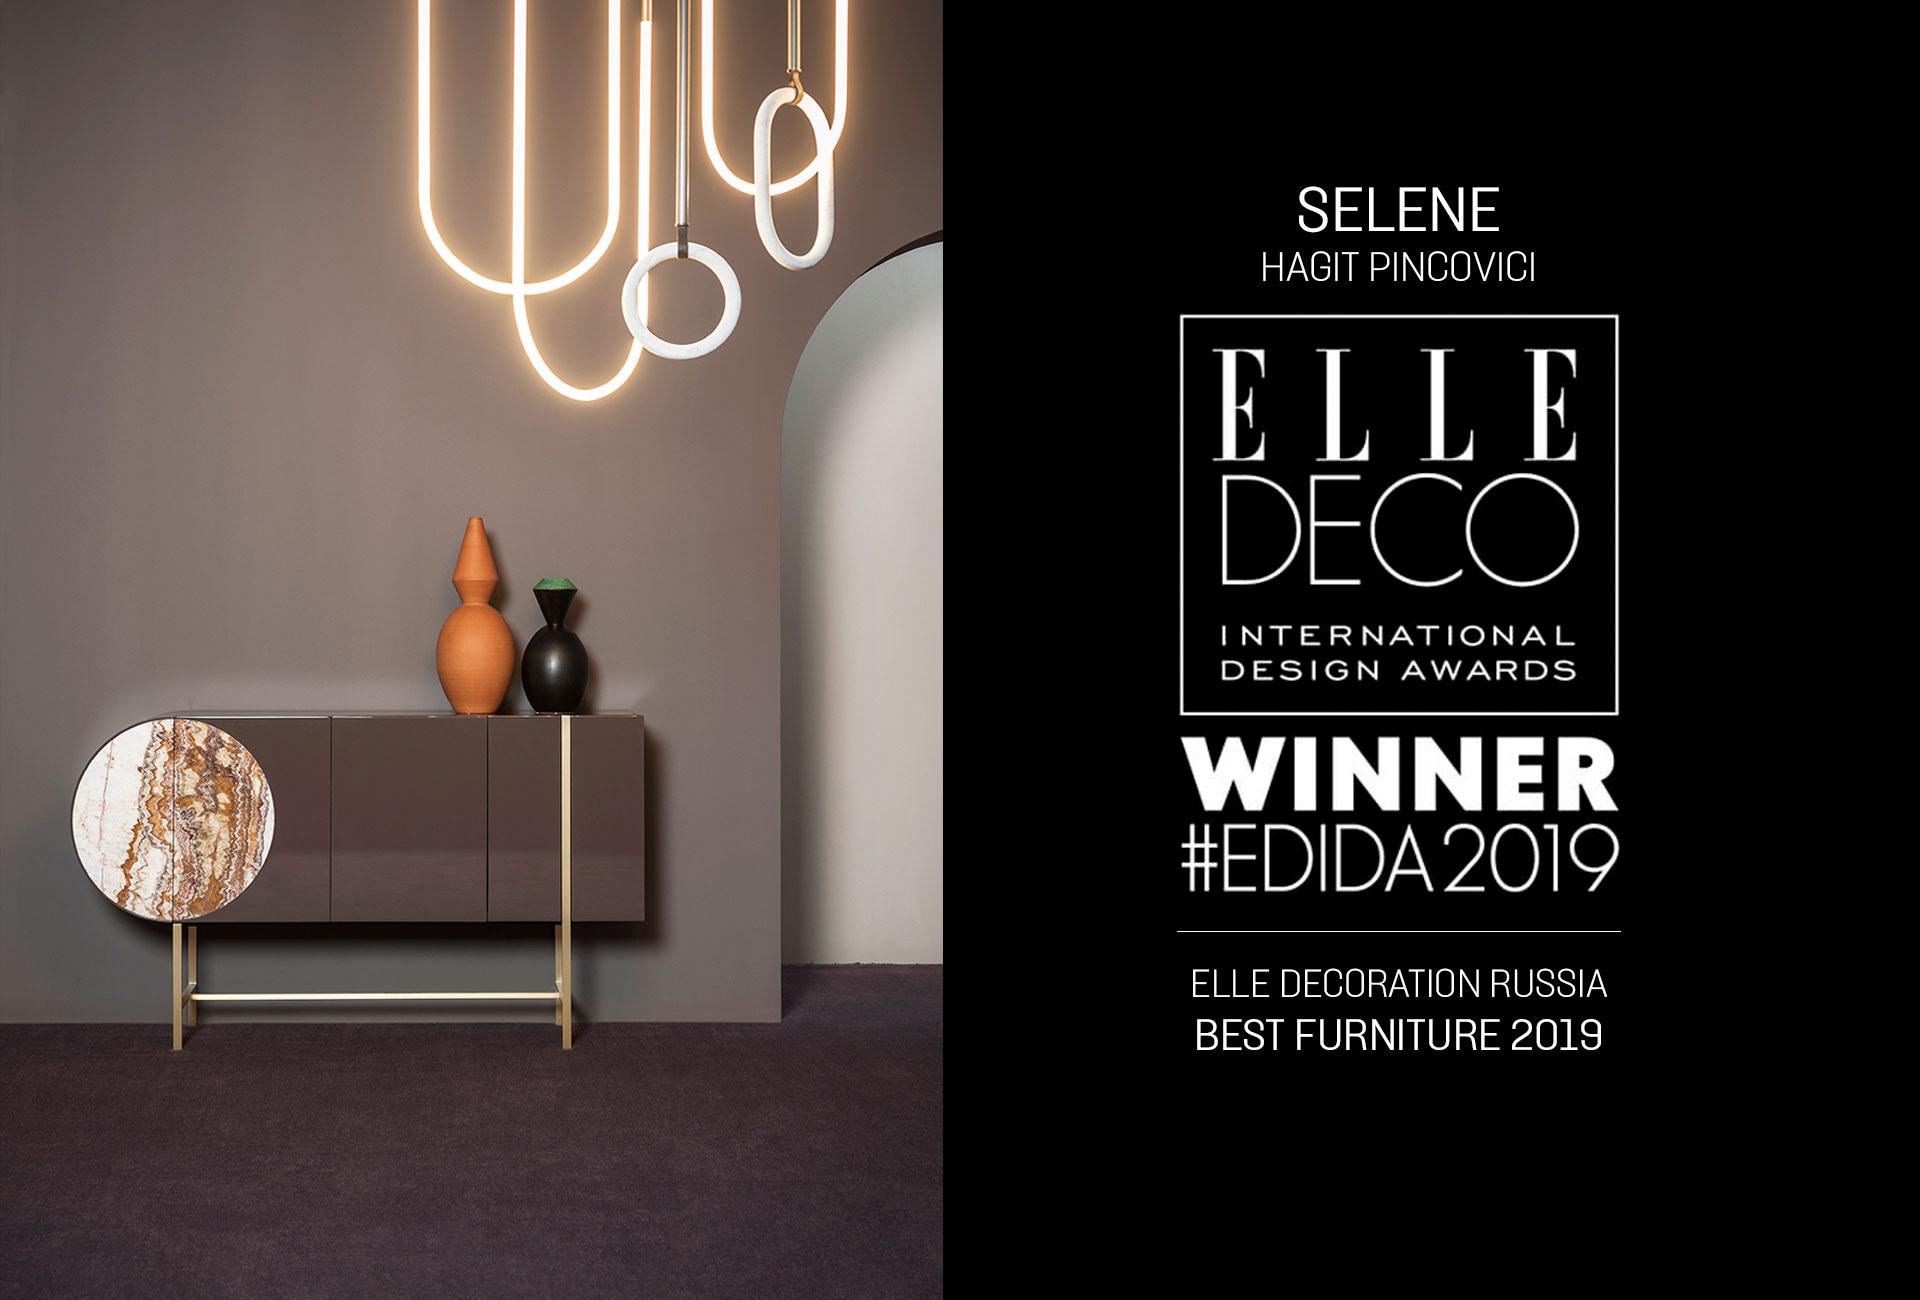 SELENE – ELLE DECORATION BEST FURNITURE 2019